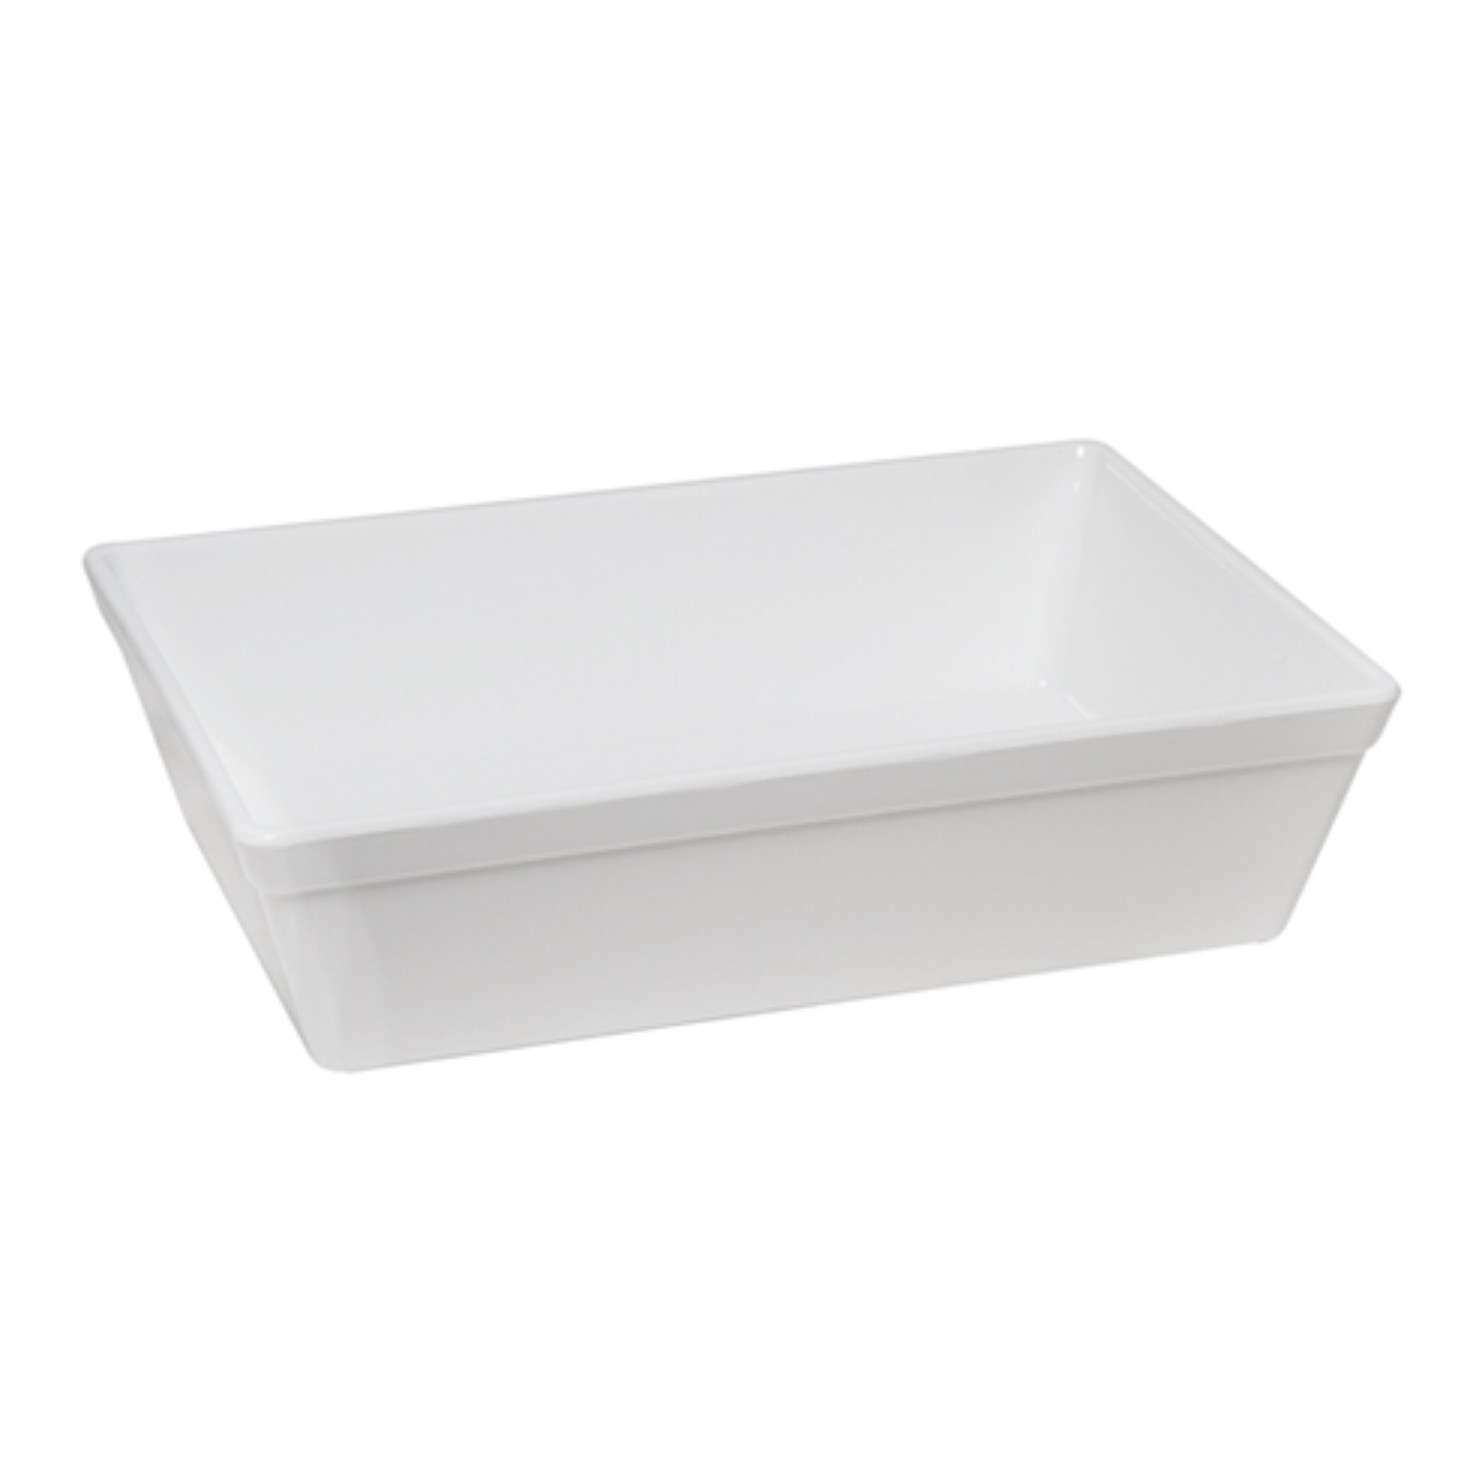 Travessa de Plastico 25cm Branca - Vem Plast